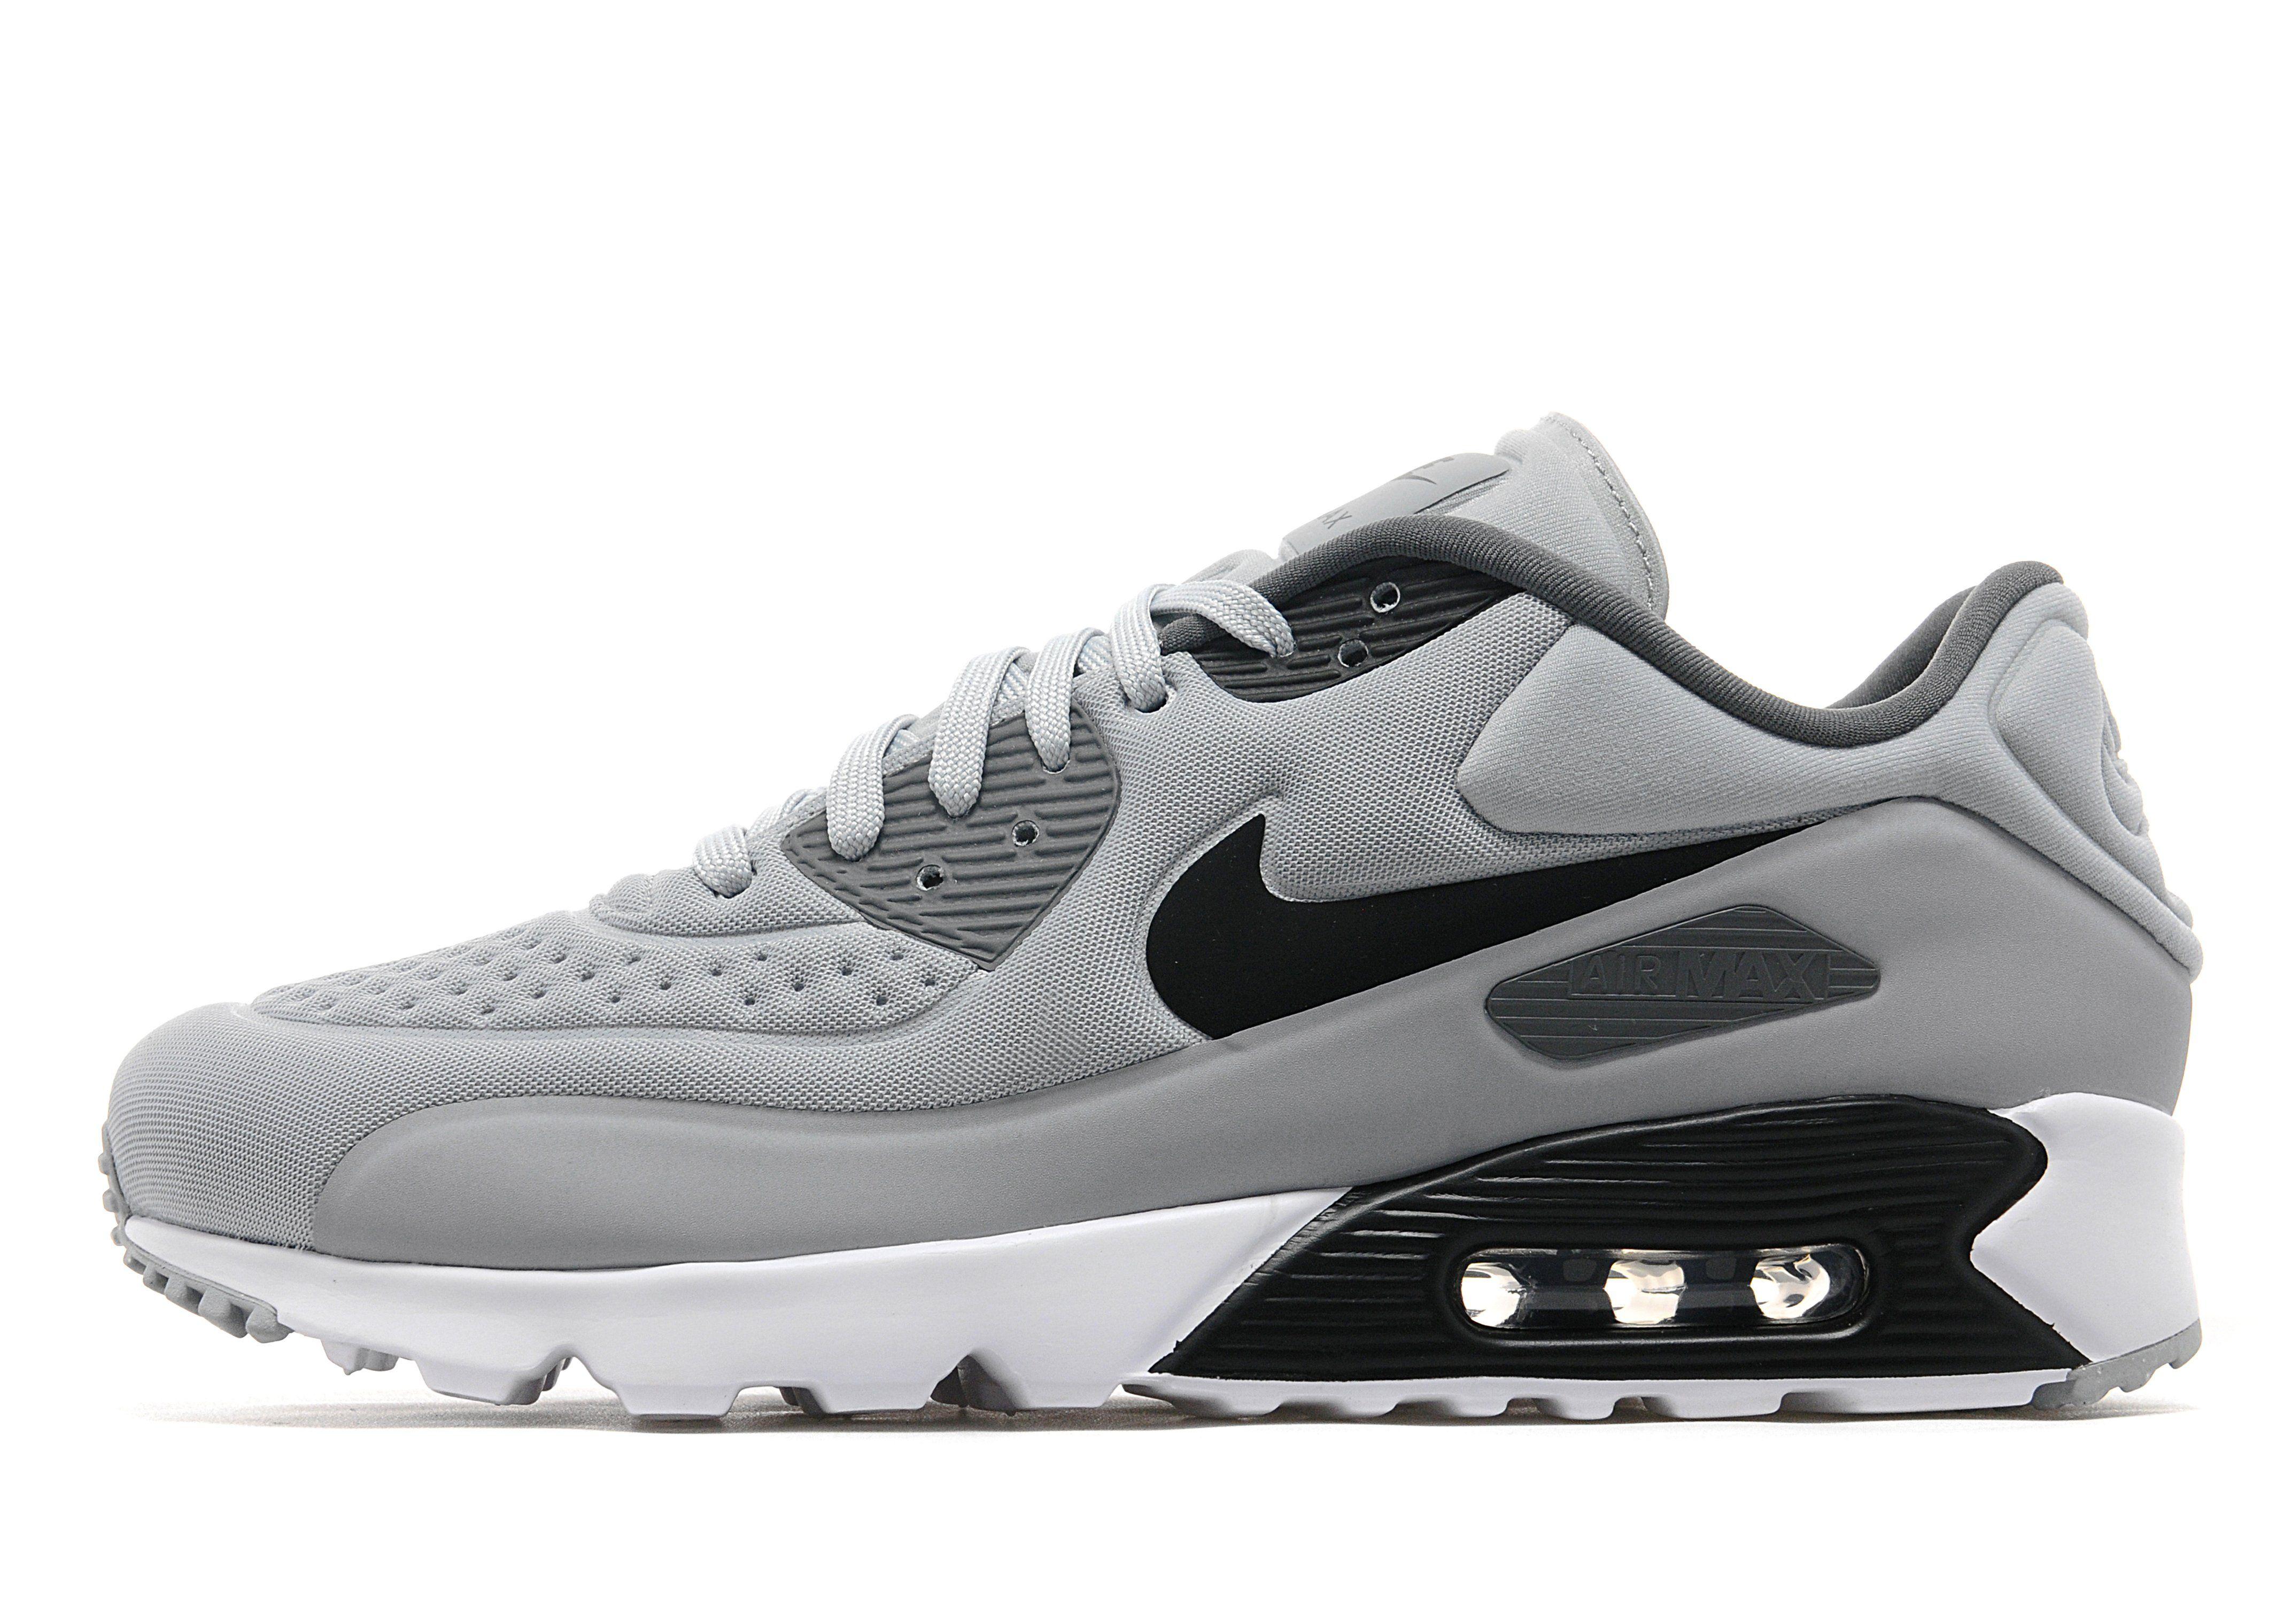 e8cf4786c116 ... and Nike Nike Air Max 90 Ultra SE JD Sports Nike Air Max Ivo Junior  Boys Trainers Nike Men Grey Black ...